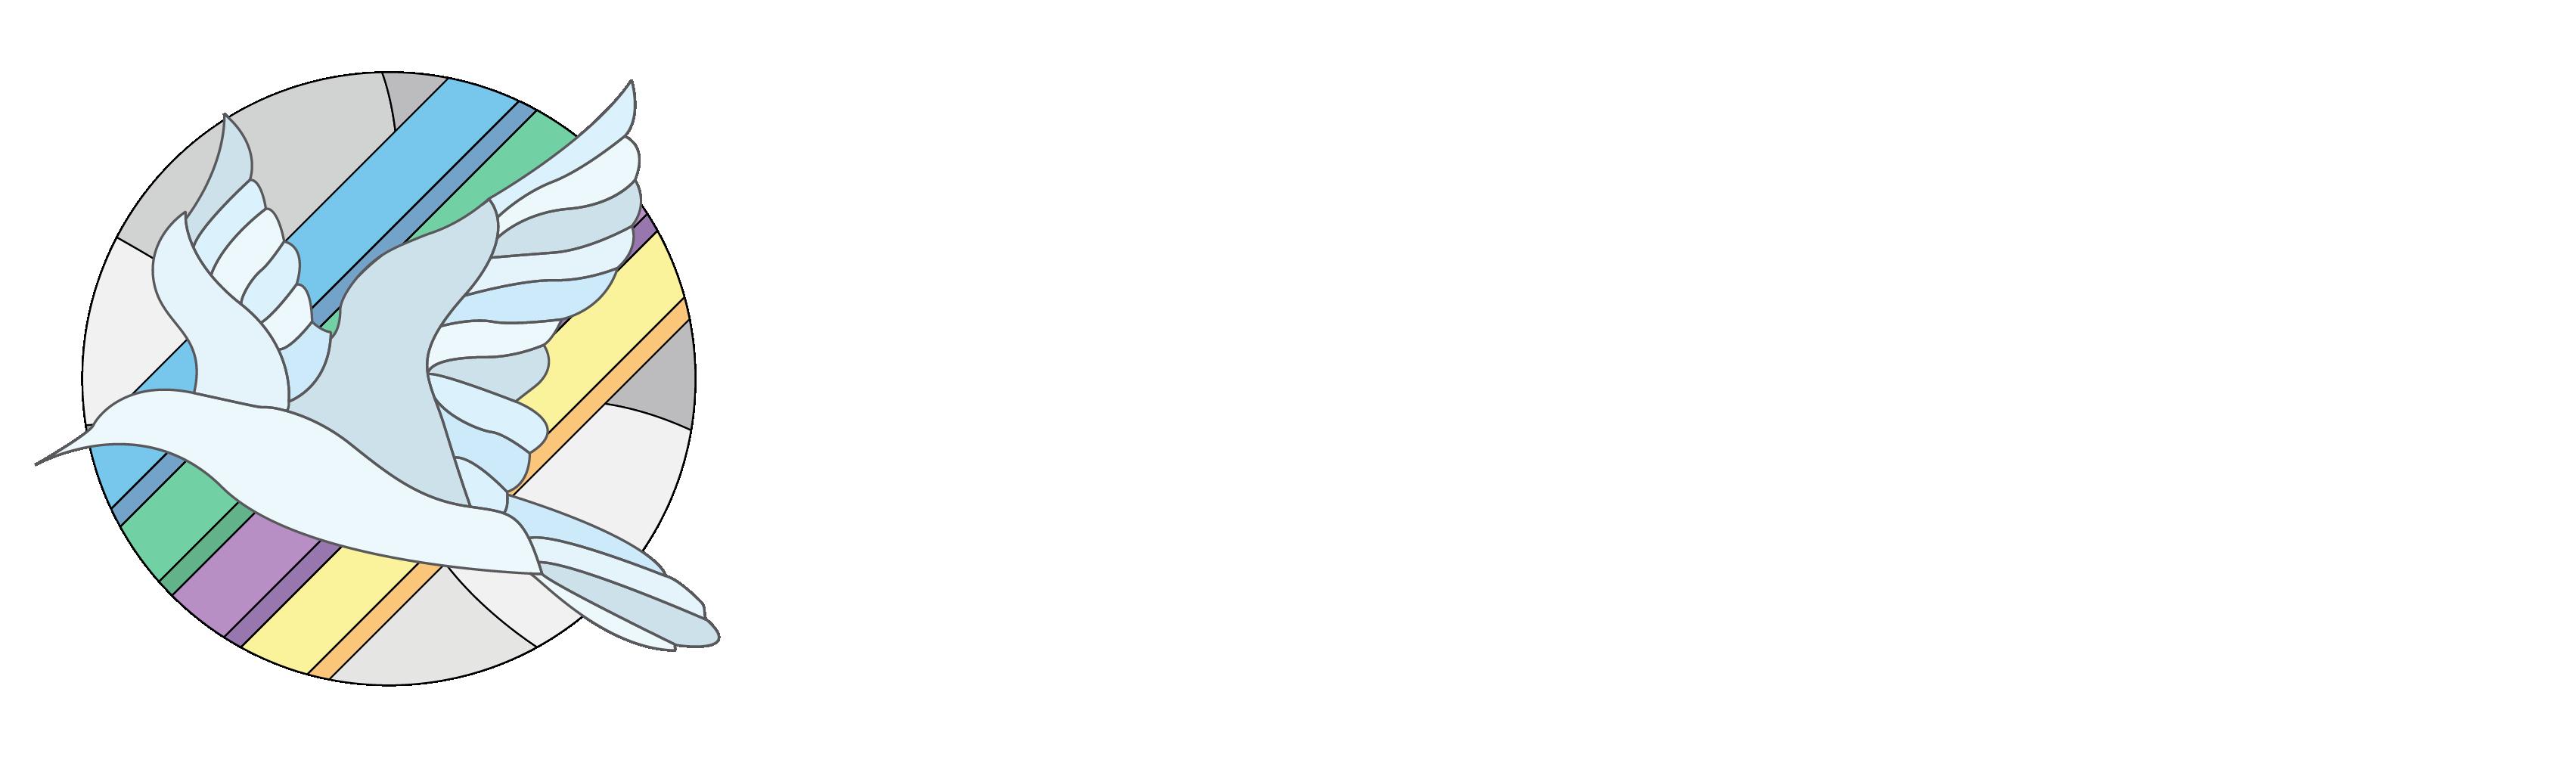 Photography clipart pictorial directory. Faith lutheran church news